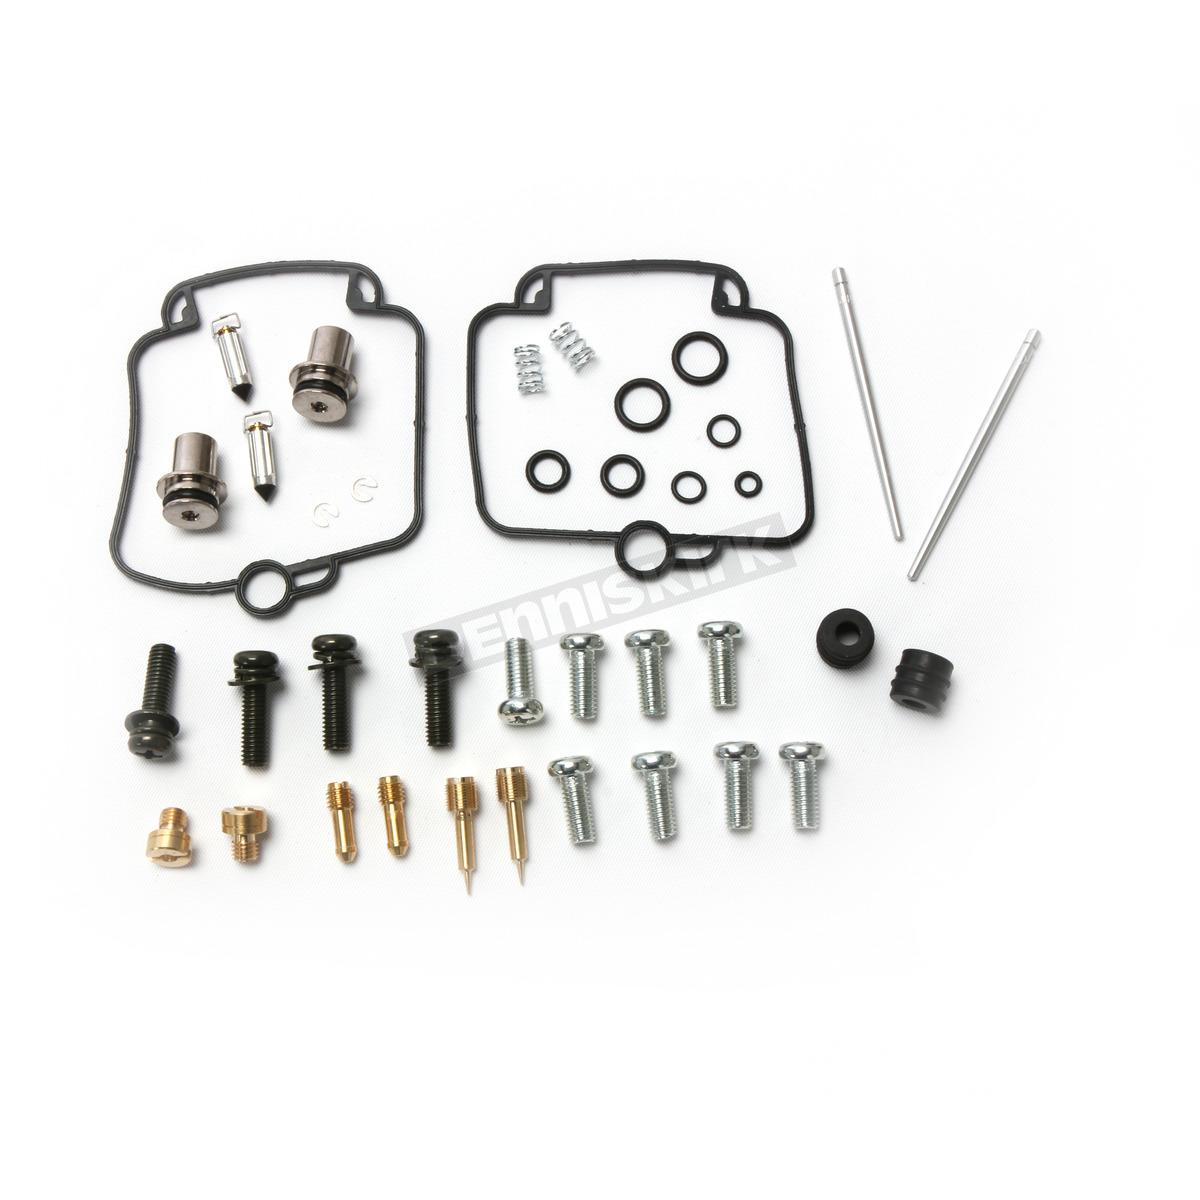 Parts Unlimited Carburetor Rebuild Kit